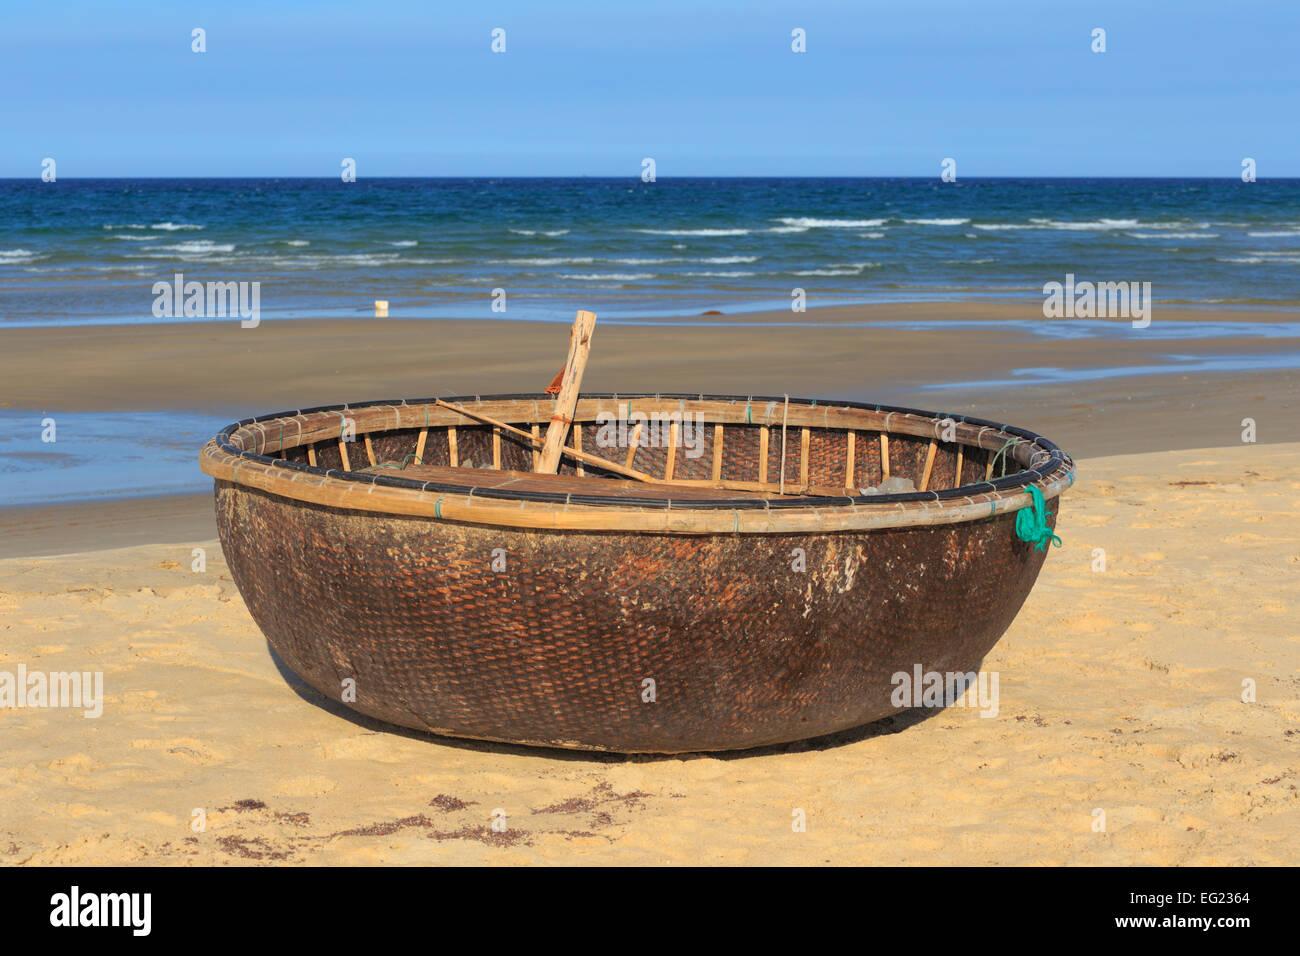 Traditional Vietnamese boat, South China Sea beach near Tam Ky, Vietnam - Stock Image